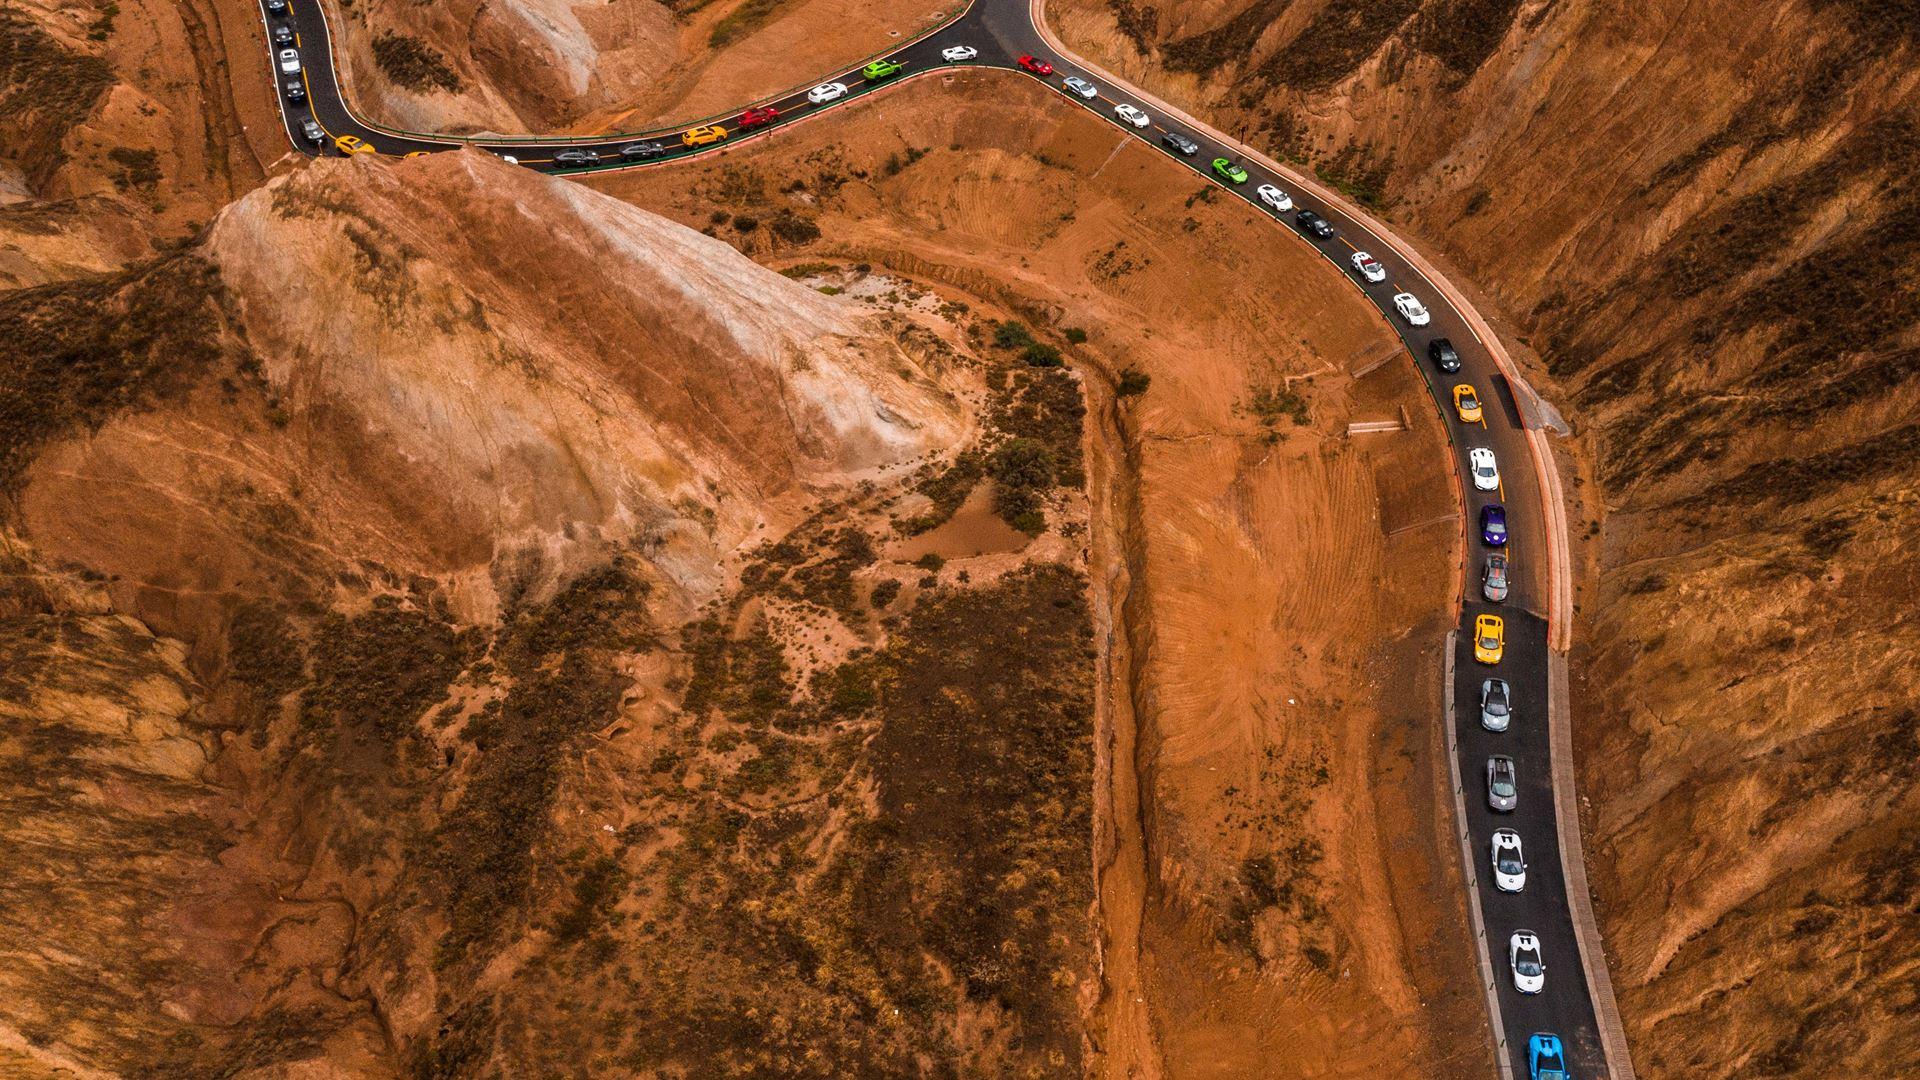 "Lamborghini Esperienza Giro ""Journey into the Vast"" Unparalleled expedition of 42 Lamborghinis through the North West of China - Image 7"